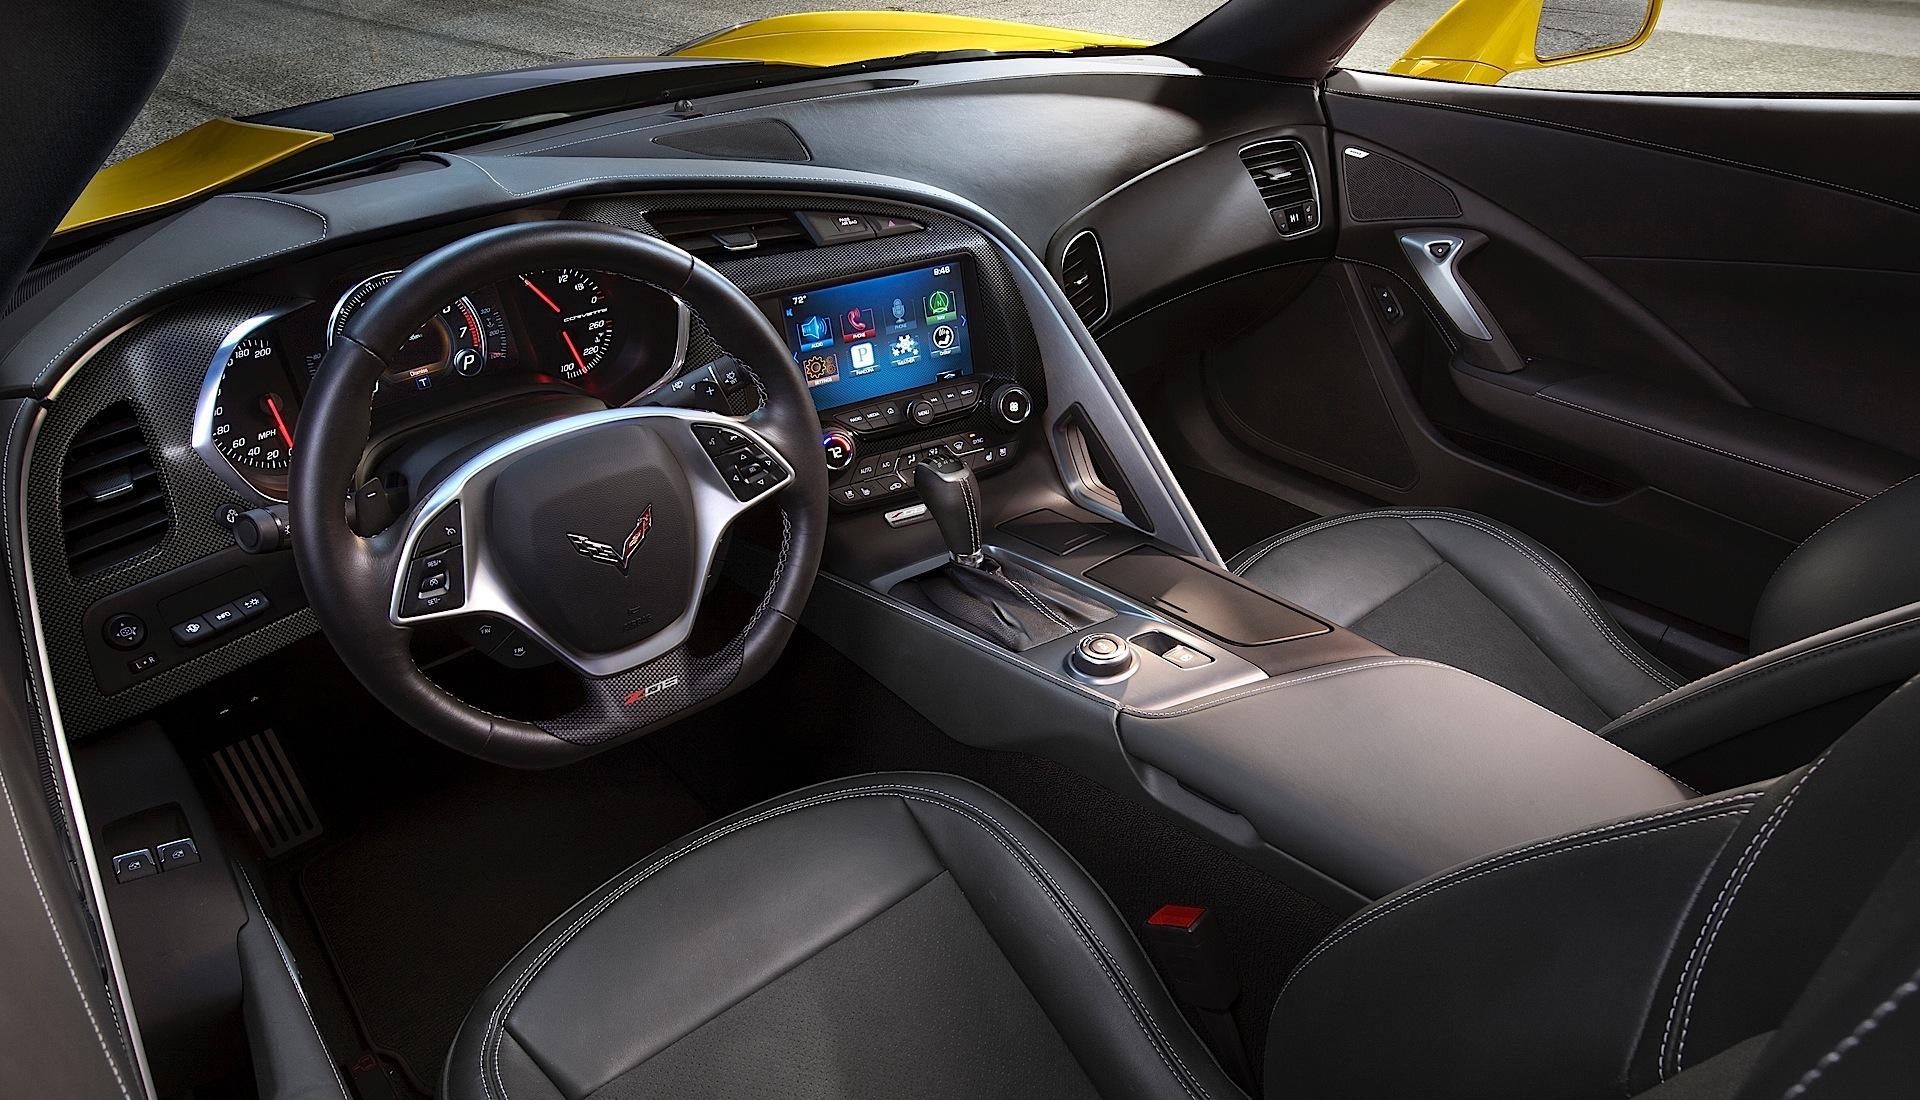 Chevrolet Corvette Z06 Specs Photos 2014 2015 2016 2017 2018